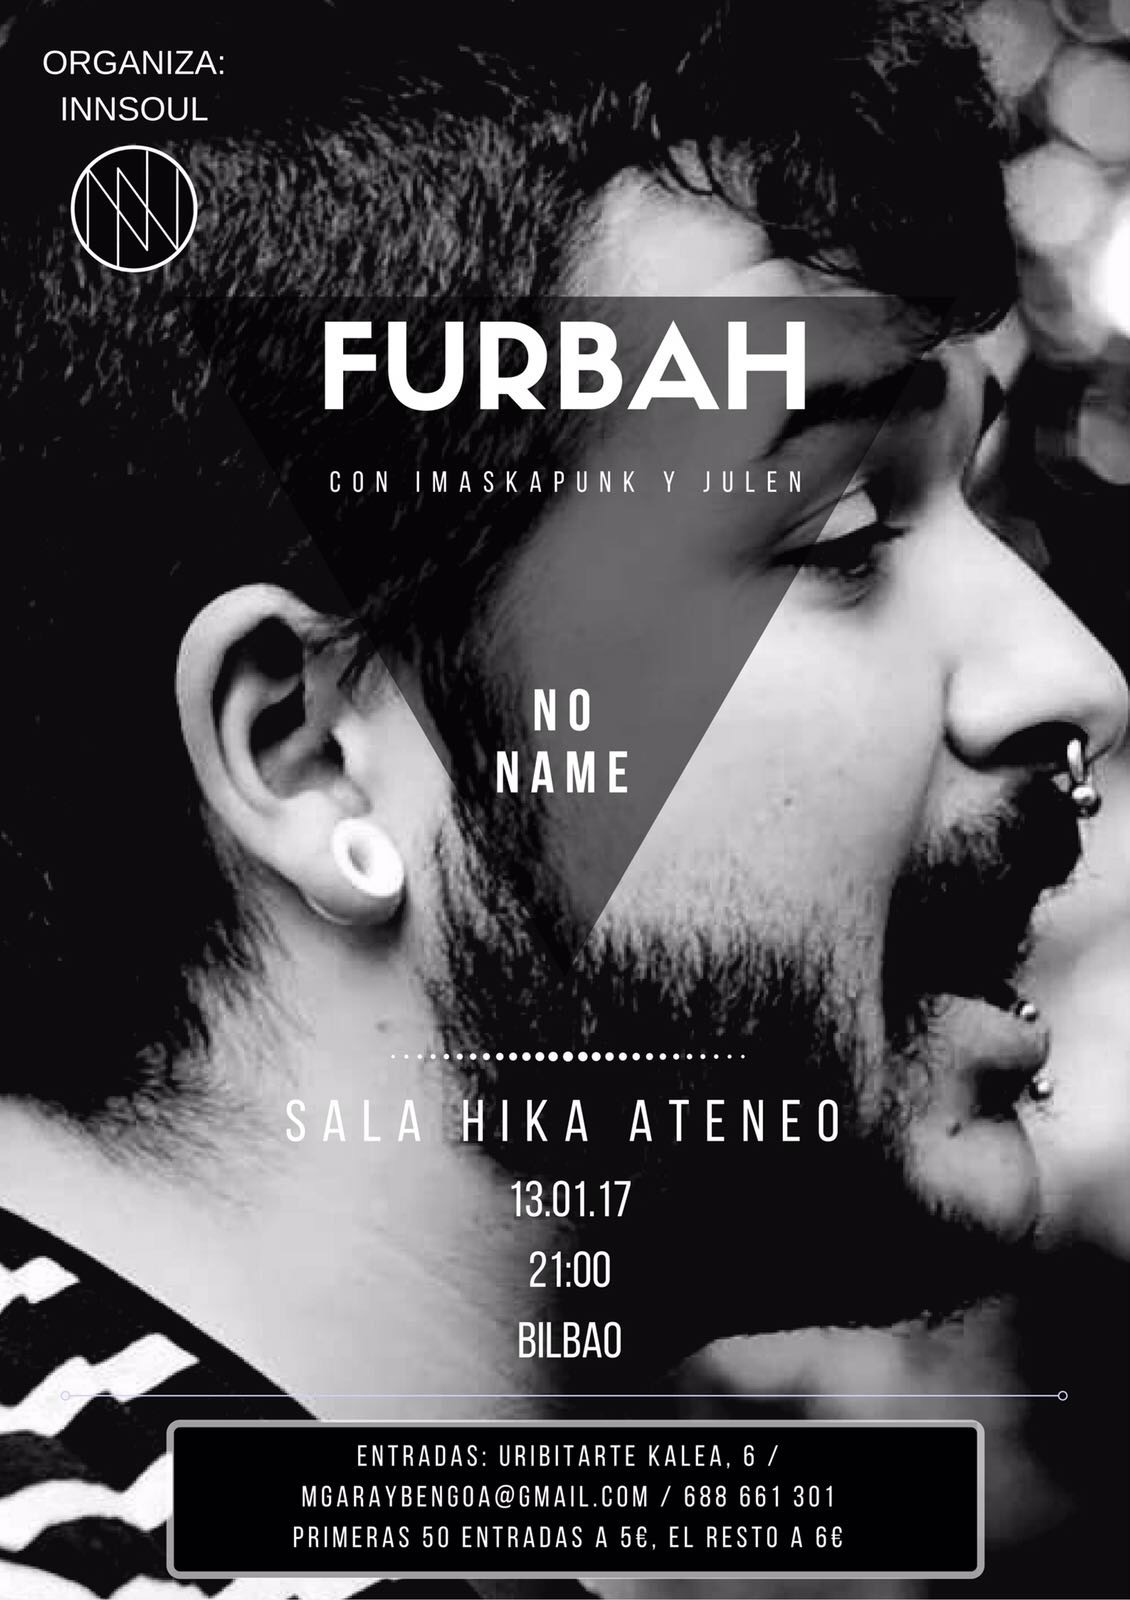 innsoul FURBAH Asier Fragas